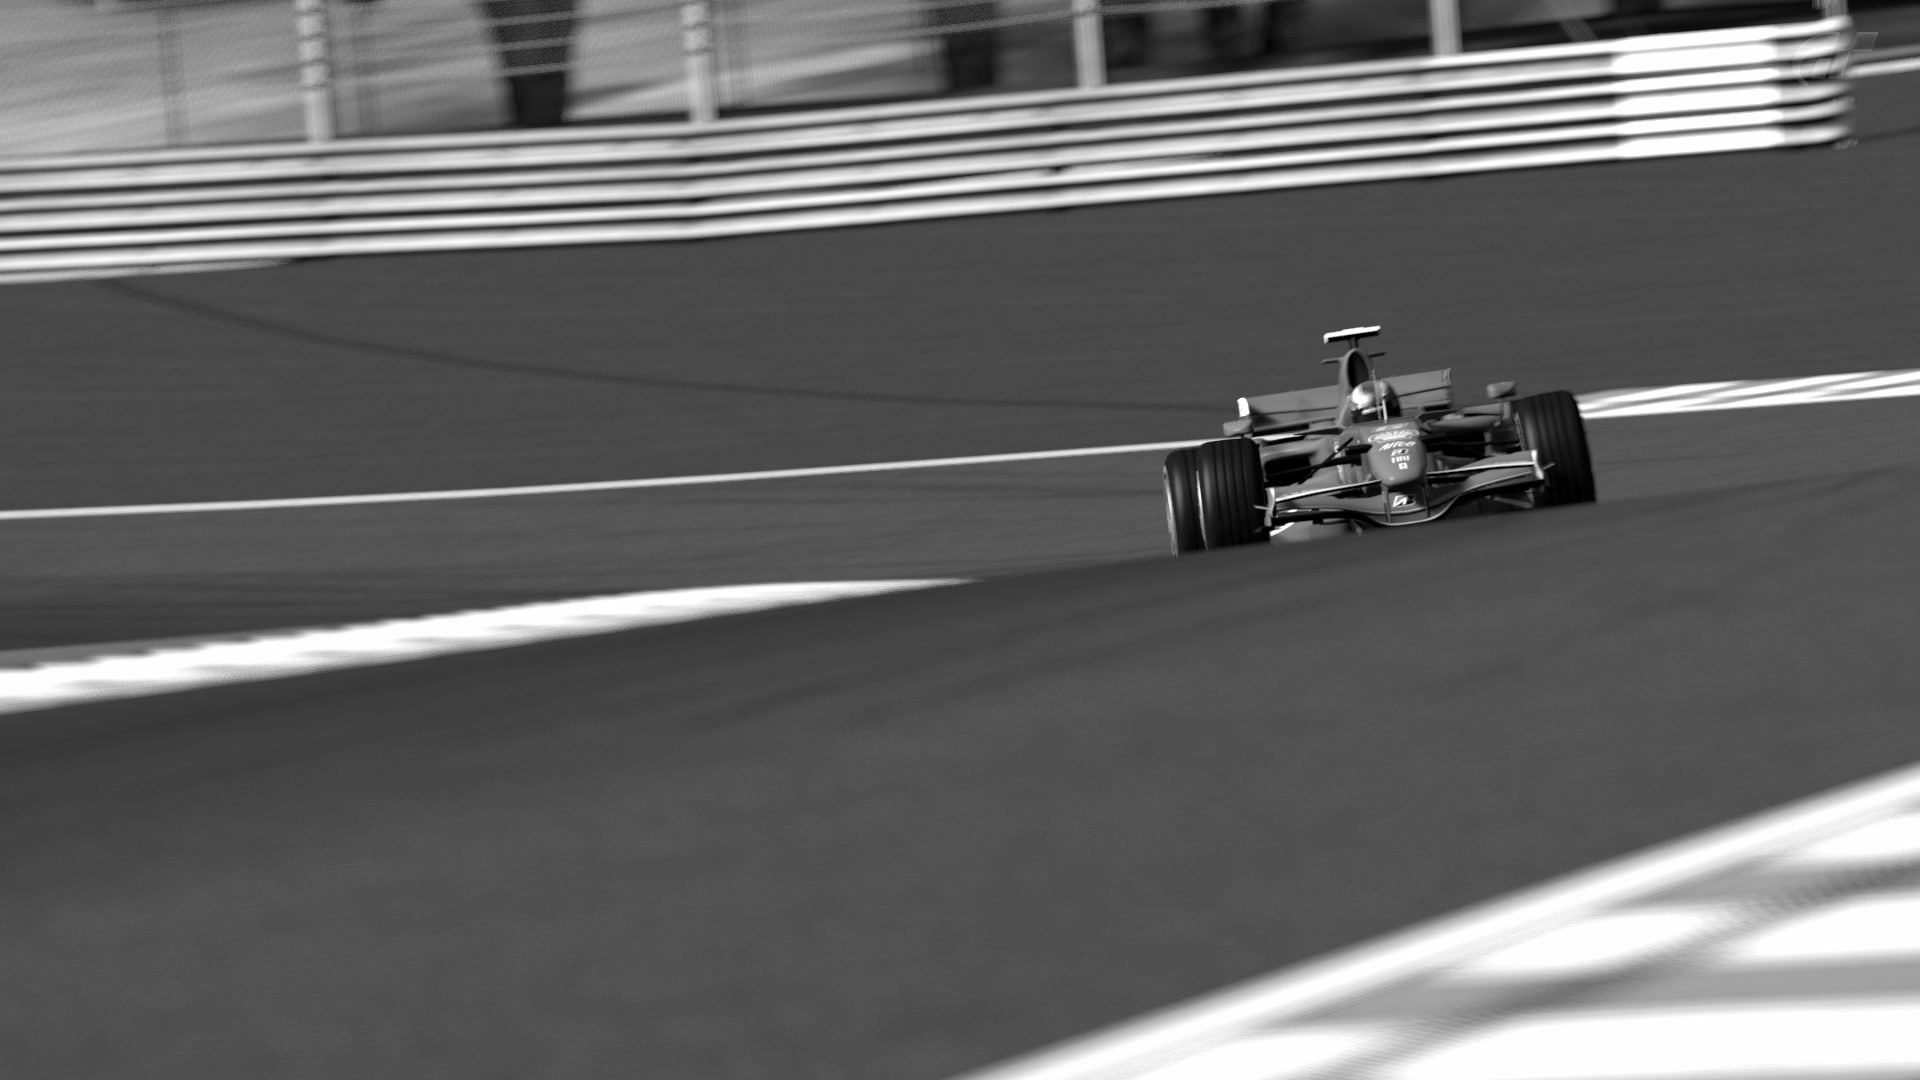 Circuit de Spa-Francorchamps_7.jpg